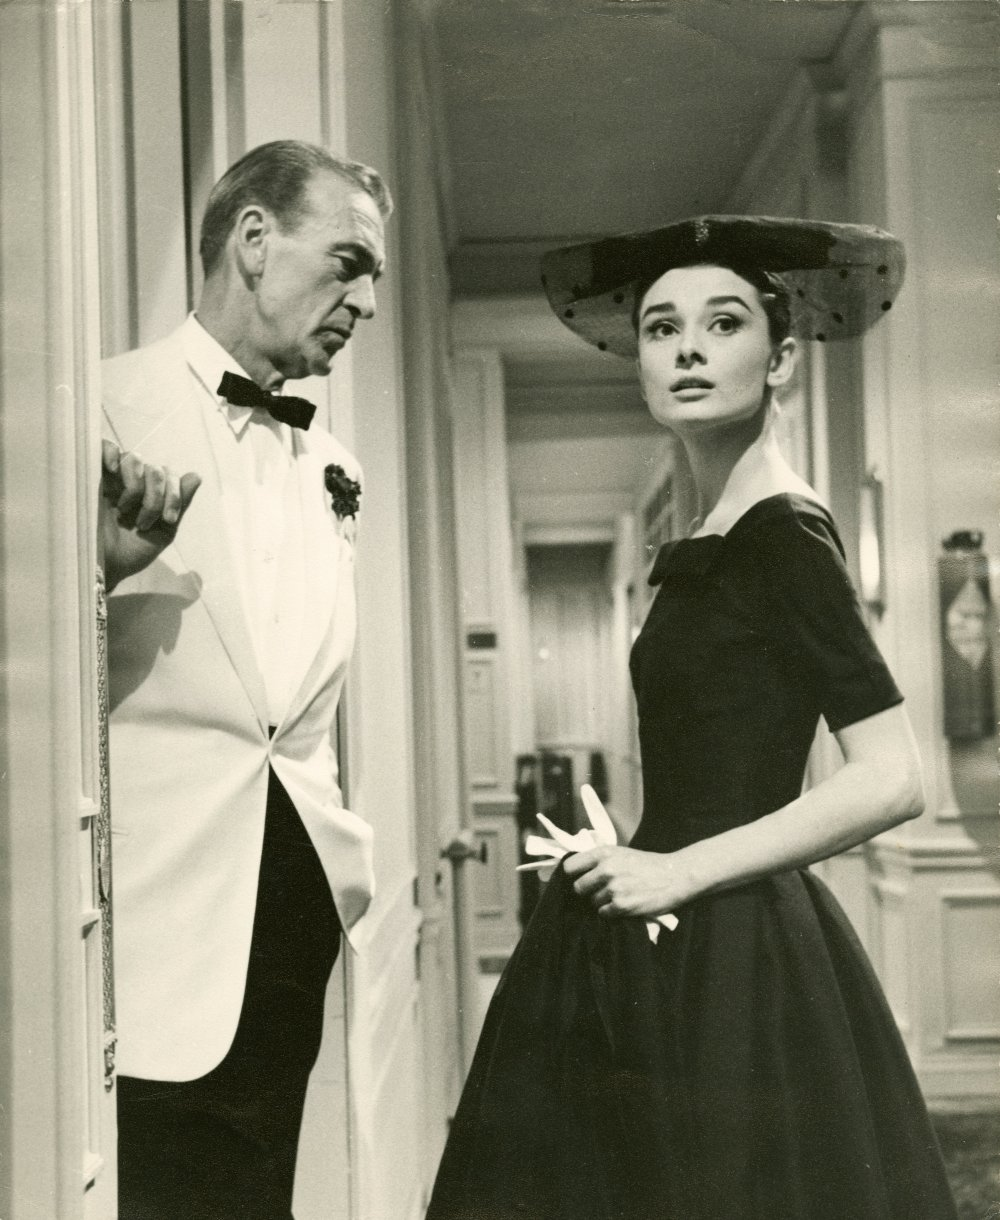 Audrey Hepburn: 10 essential films